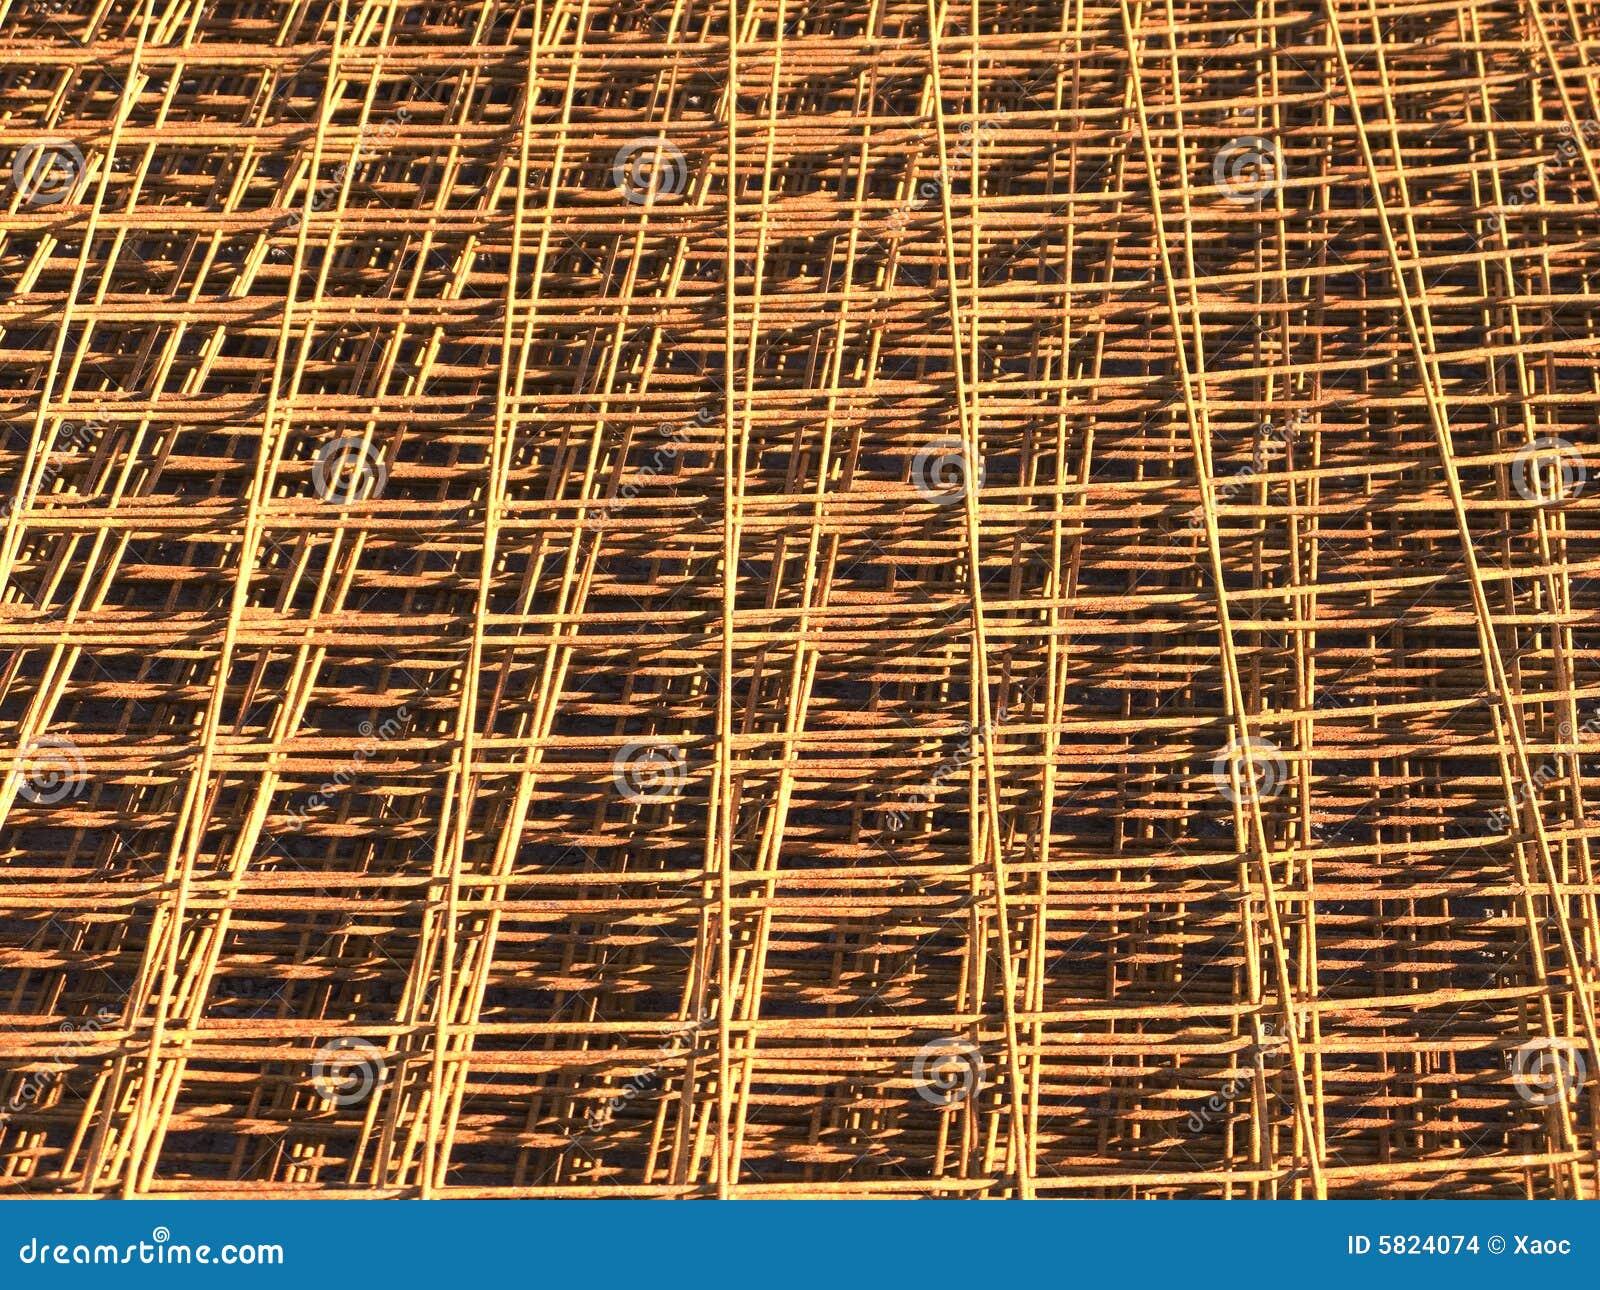 Steel Reinforcement Bars : Close up of reinforcing steel bar mesh stock images